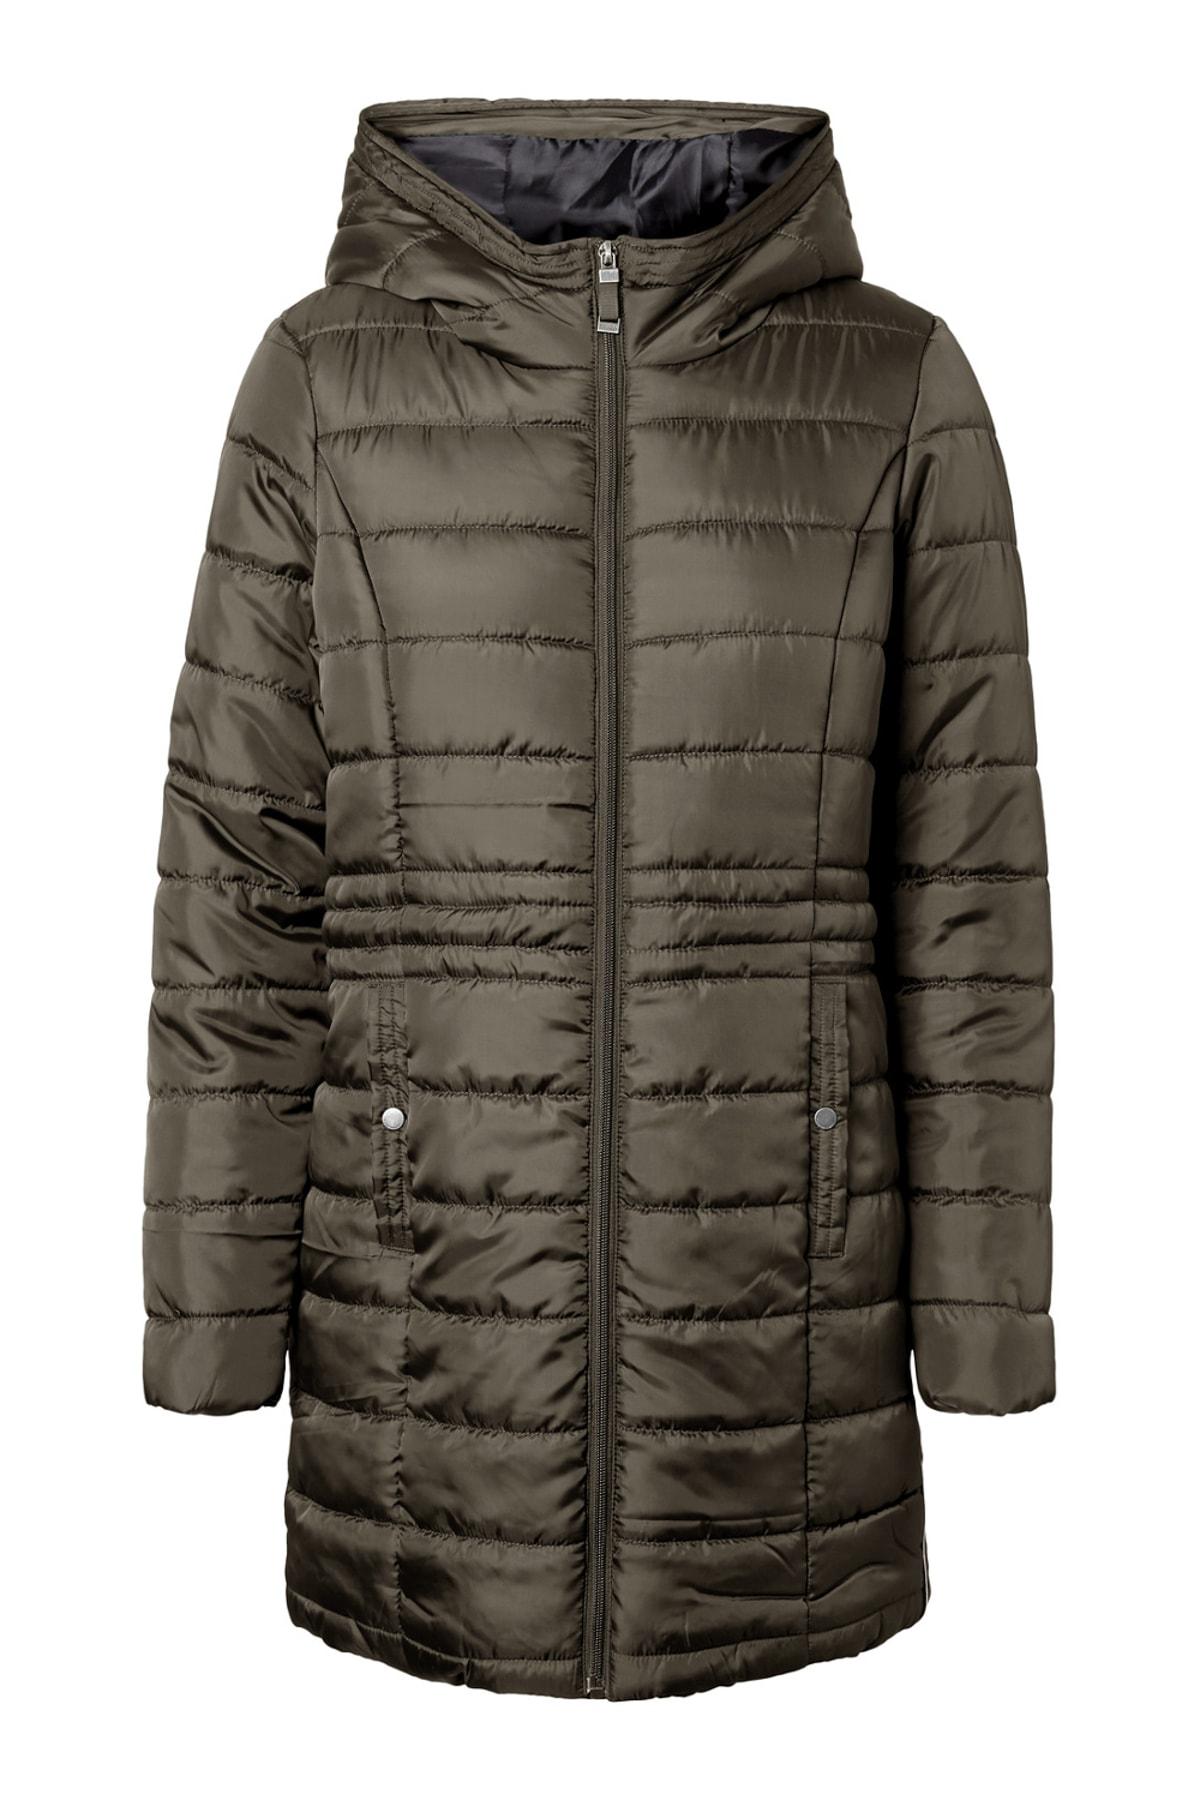 Vero Moda Kadın Kahverengi Mont 10214904 1